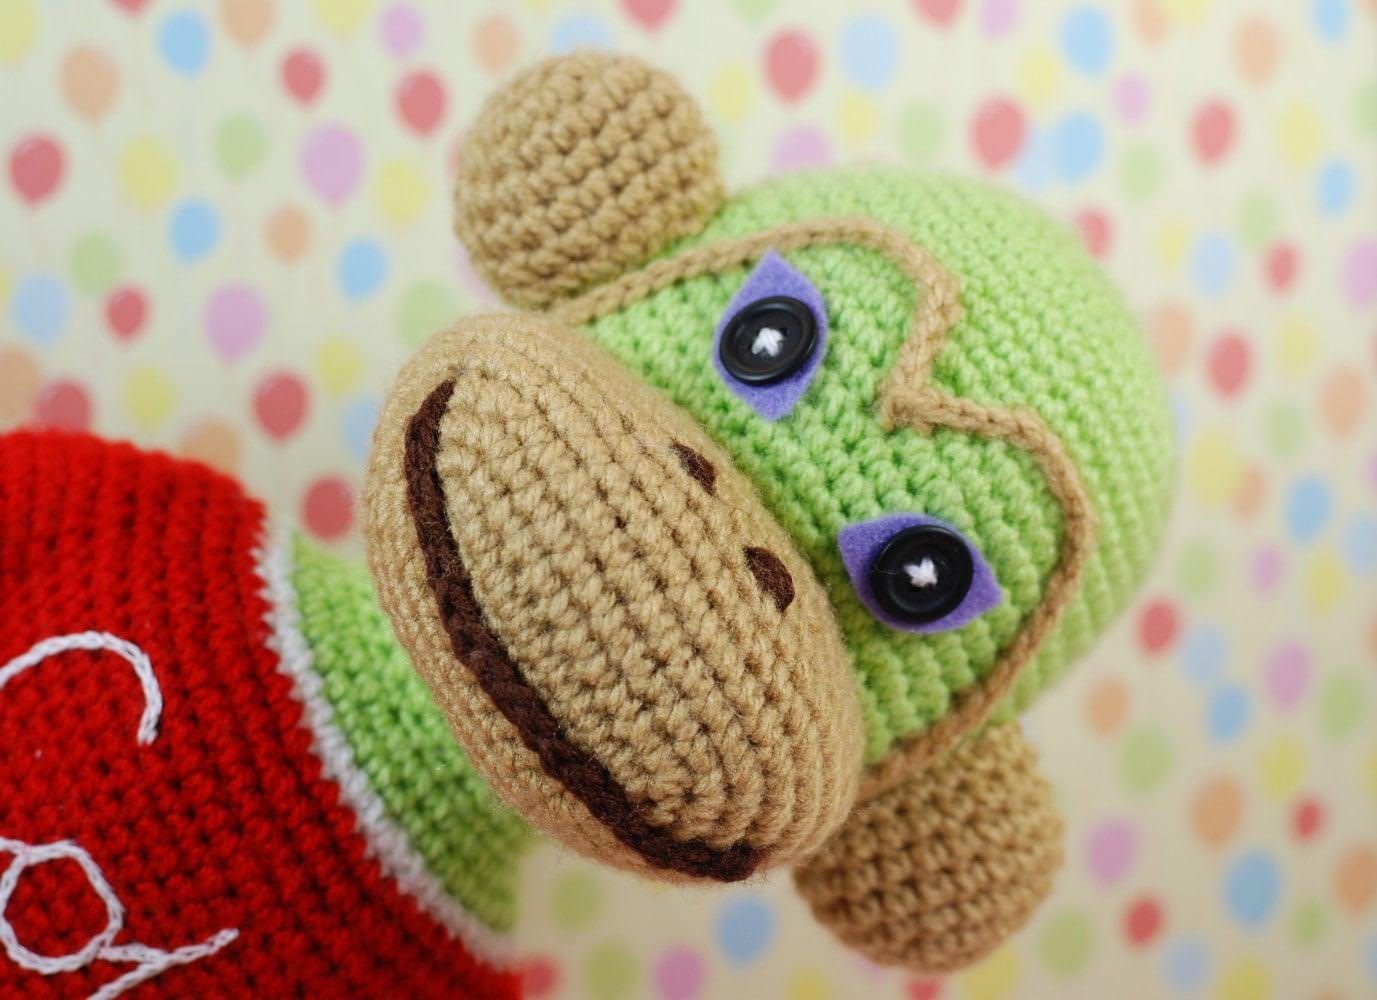 Crochet Toys For Boys : Cola monkey amigurumi crochet toy animal baby girl boy